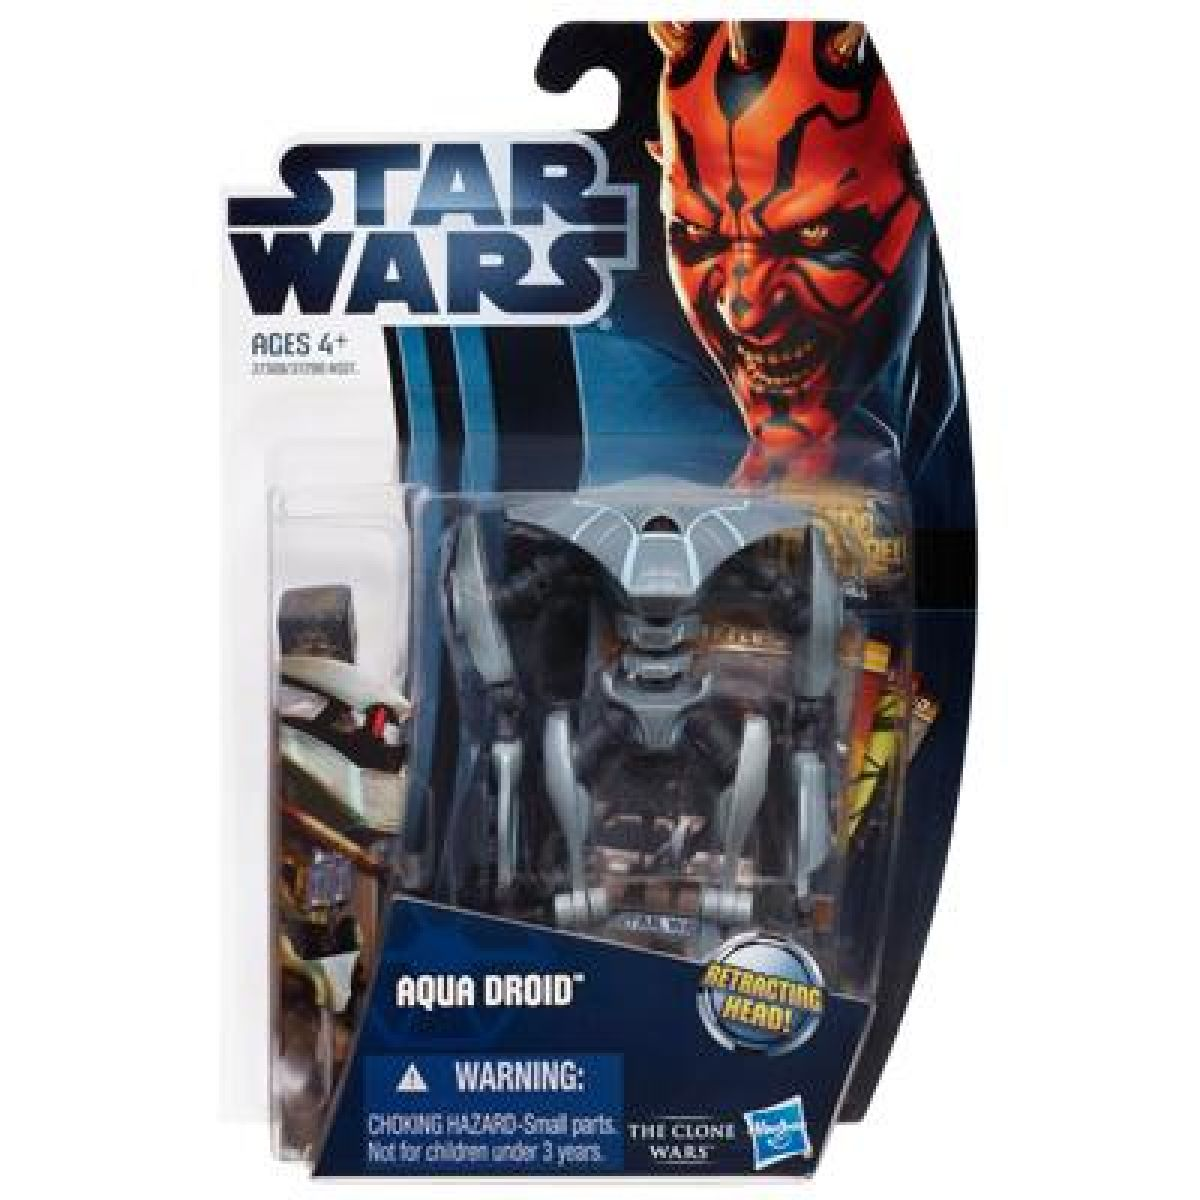 Star Wars figurky clone wars Hasbro 37290 - Republic Commando Boss